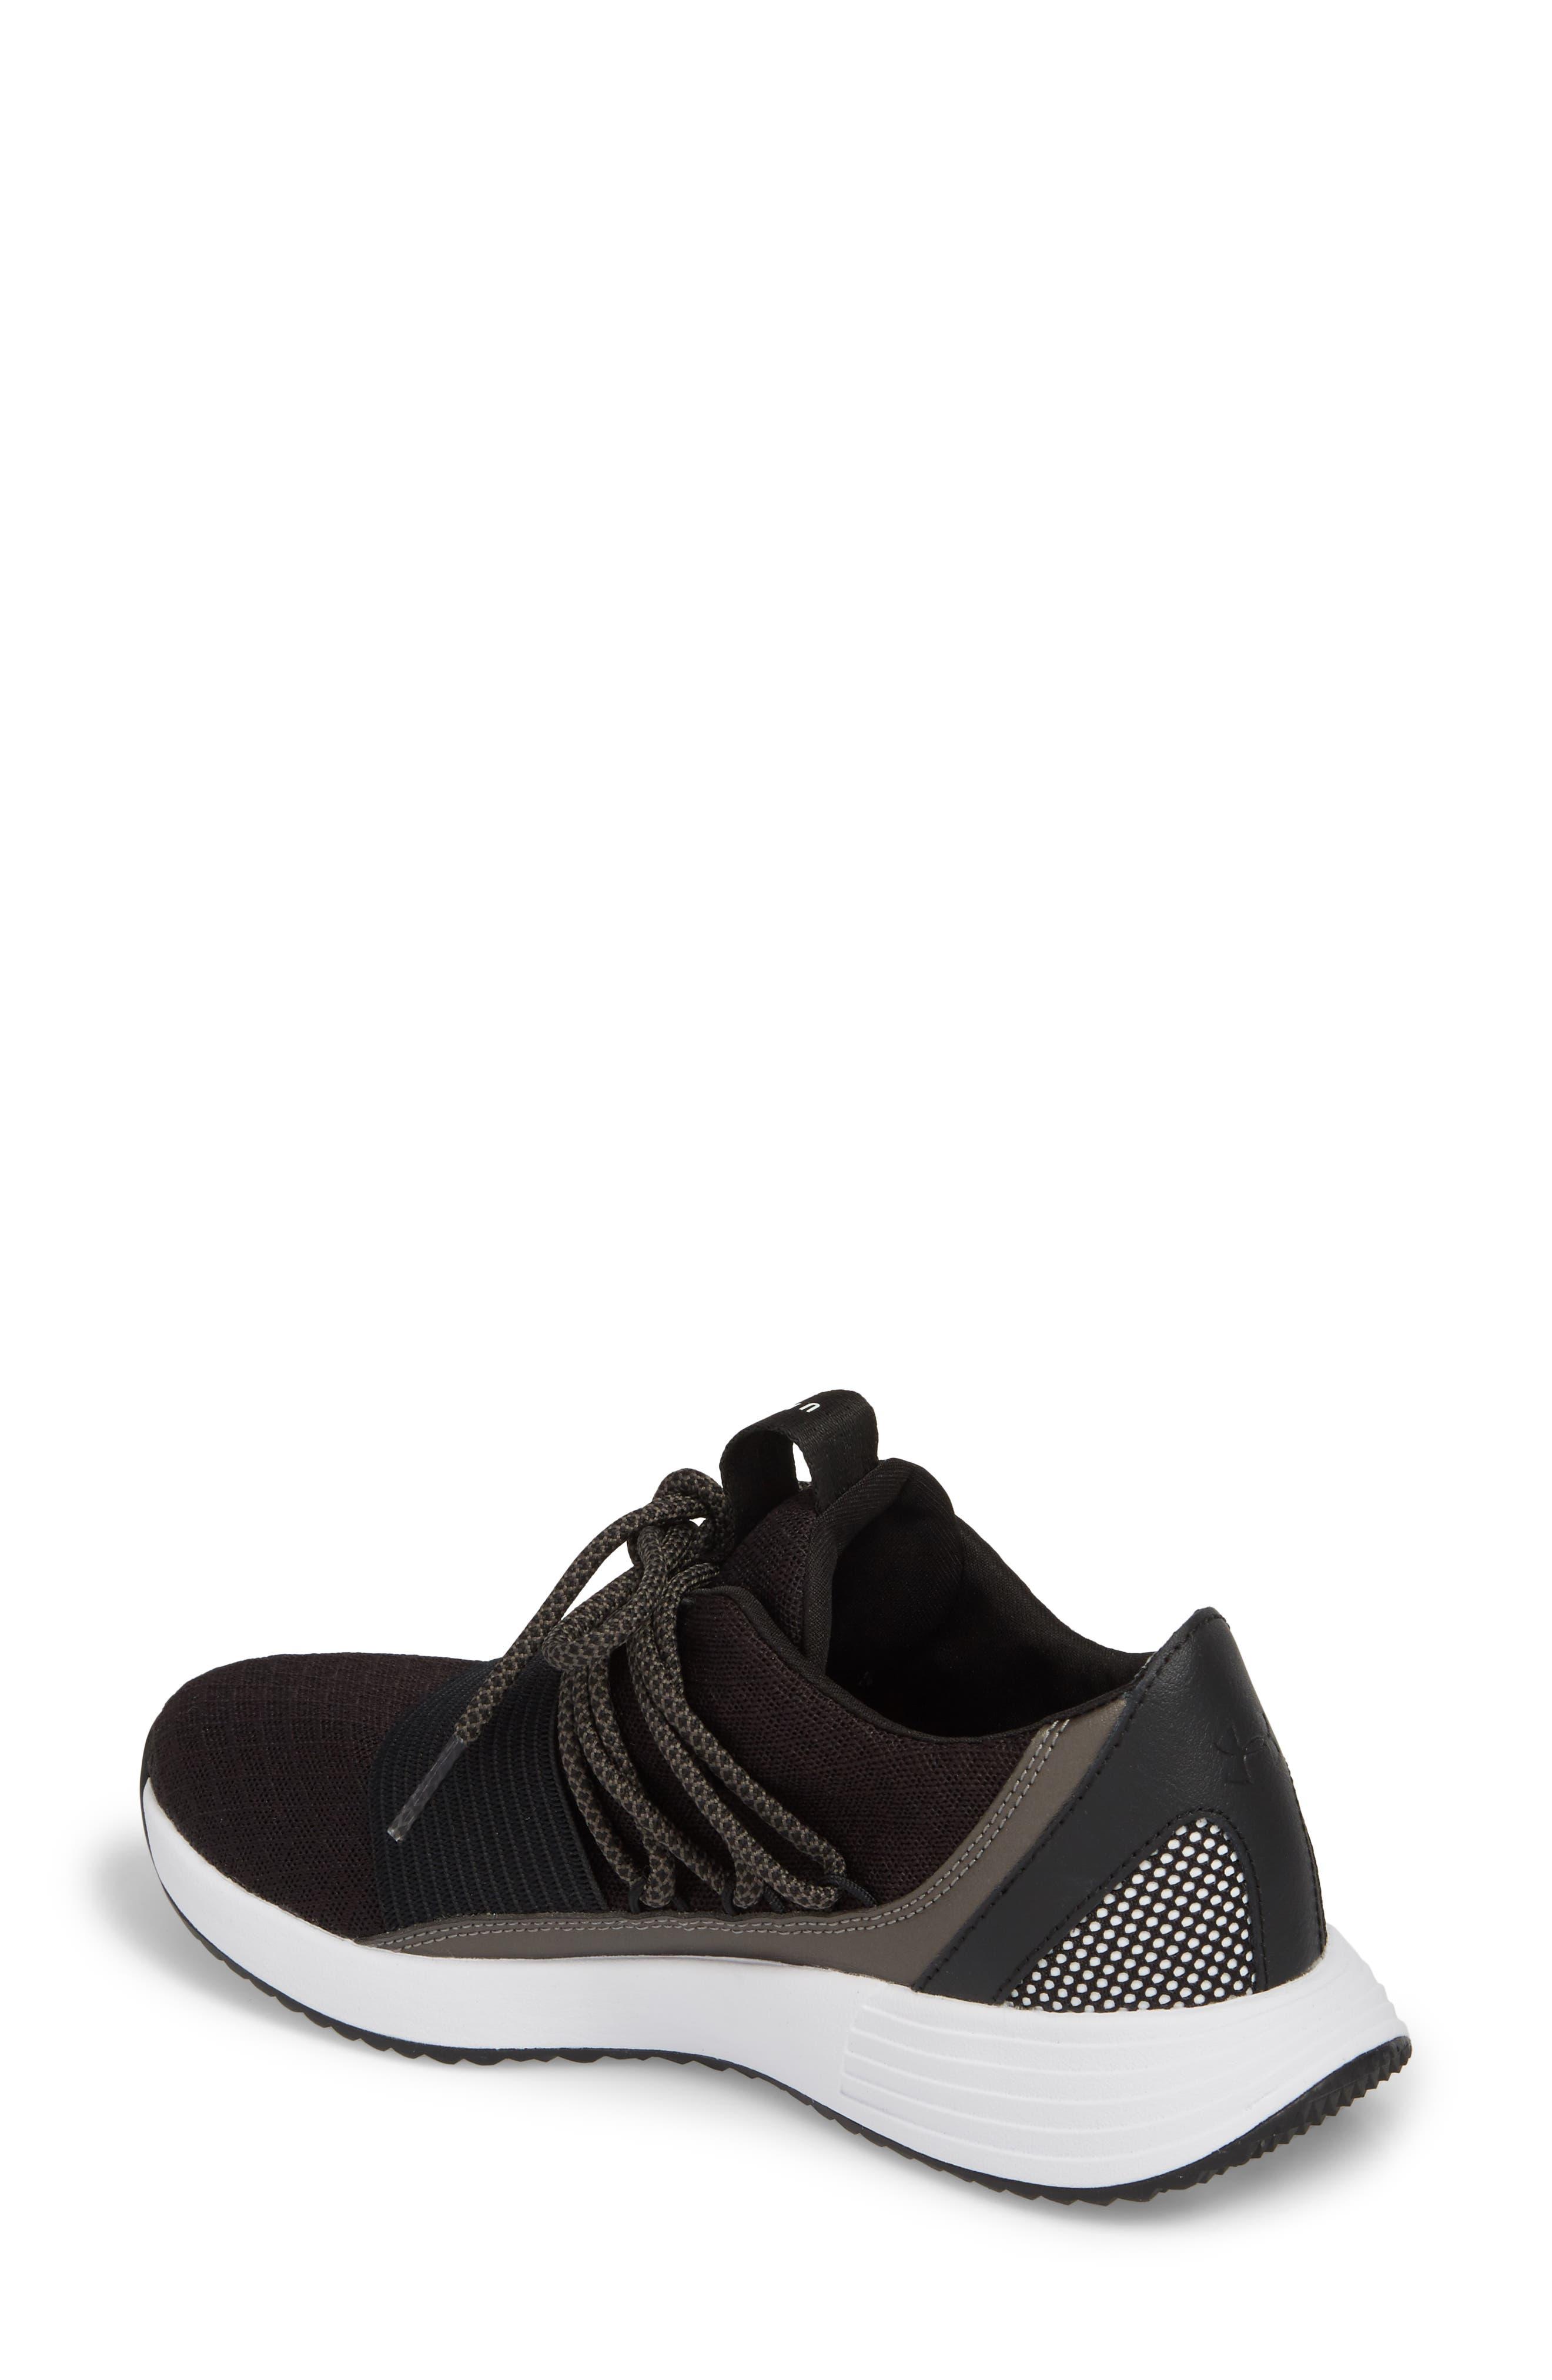 Breathe Low Top Sneaker,                             Alternate thumbnail 2, color,                             001